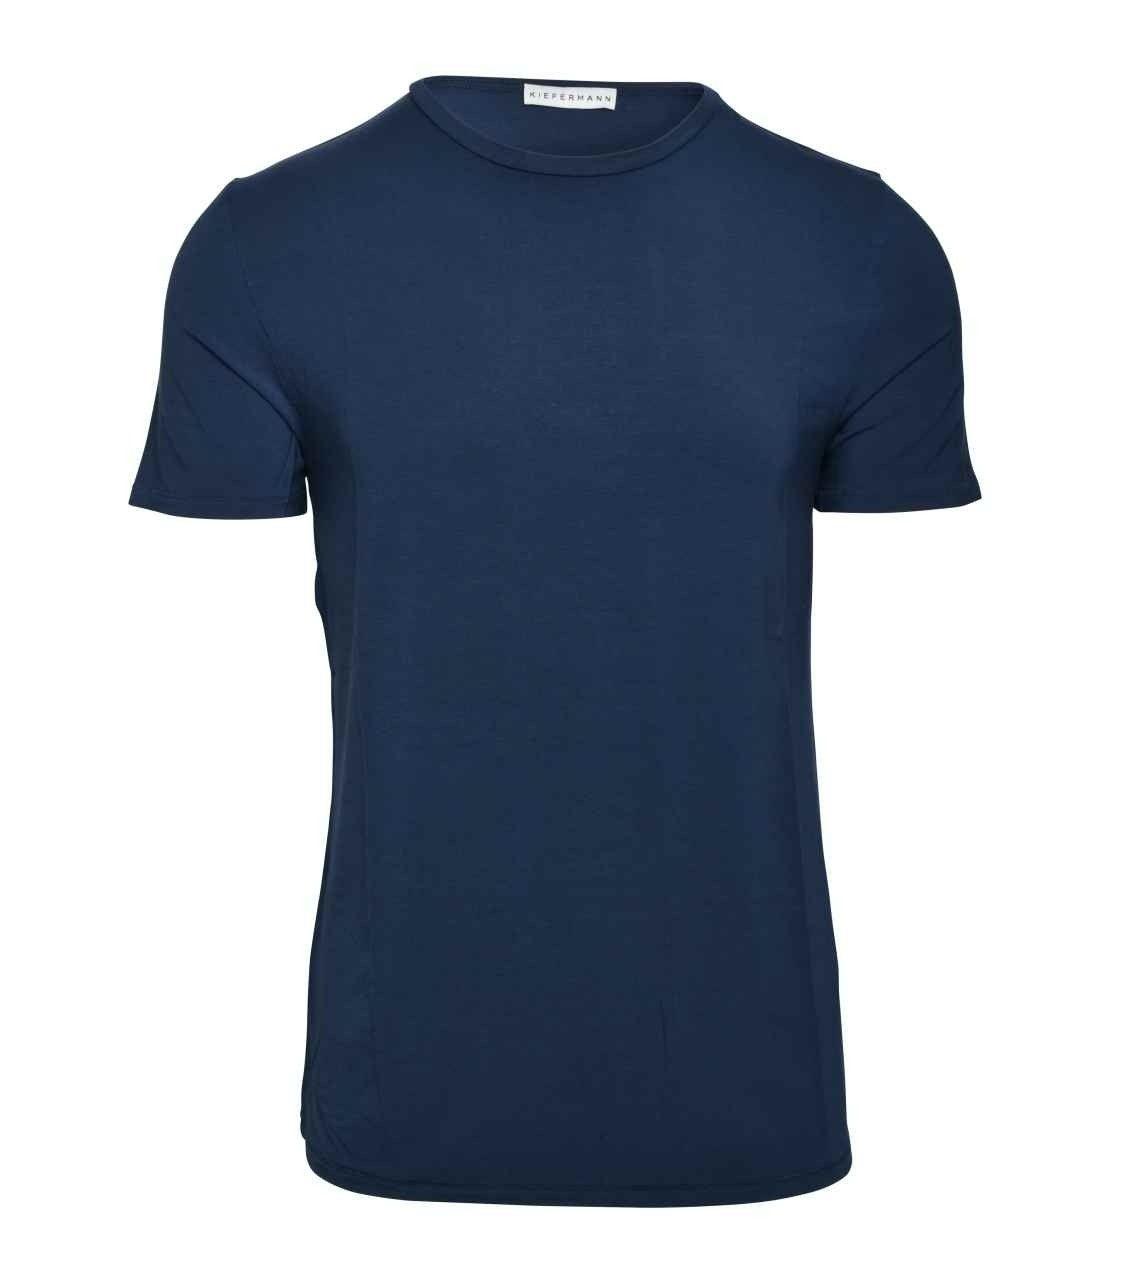 KIEFERMANN - Herren T-Shirt - Damian - Deep Water